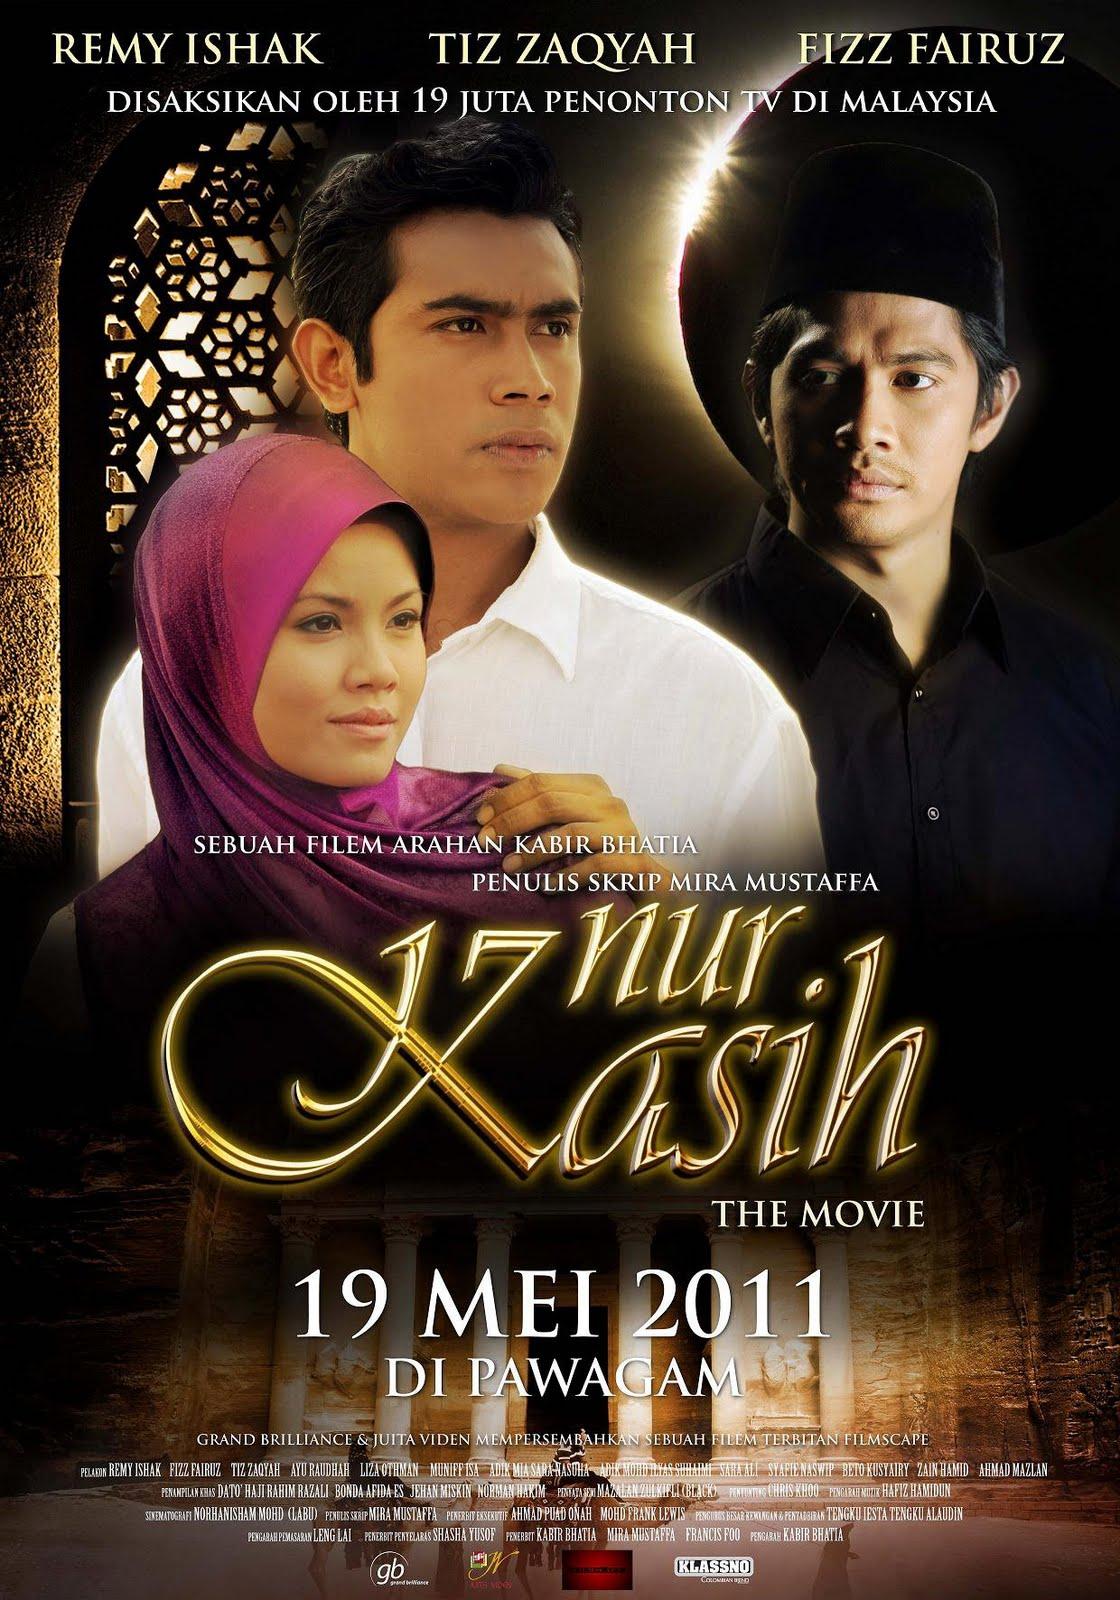 korang belum tonton trailer atau preview filem Nur Kasih The Movie ...